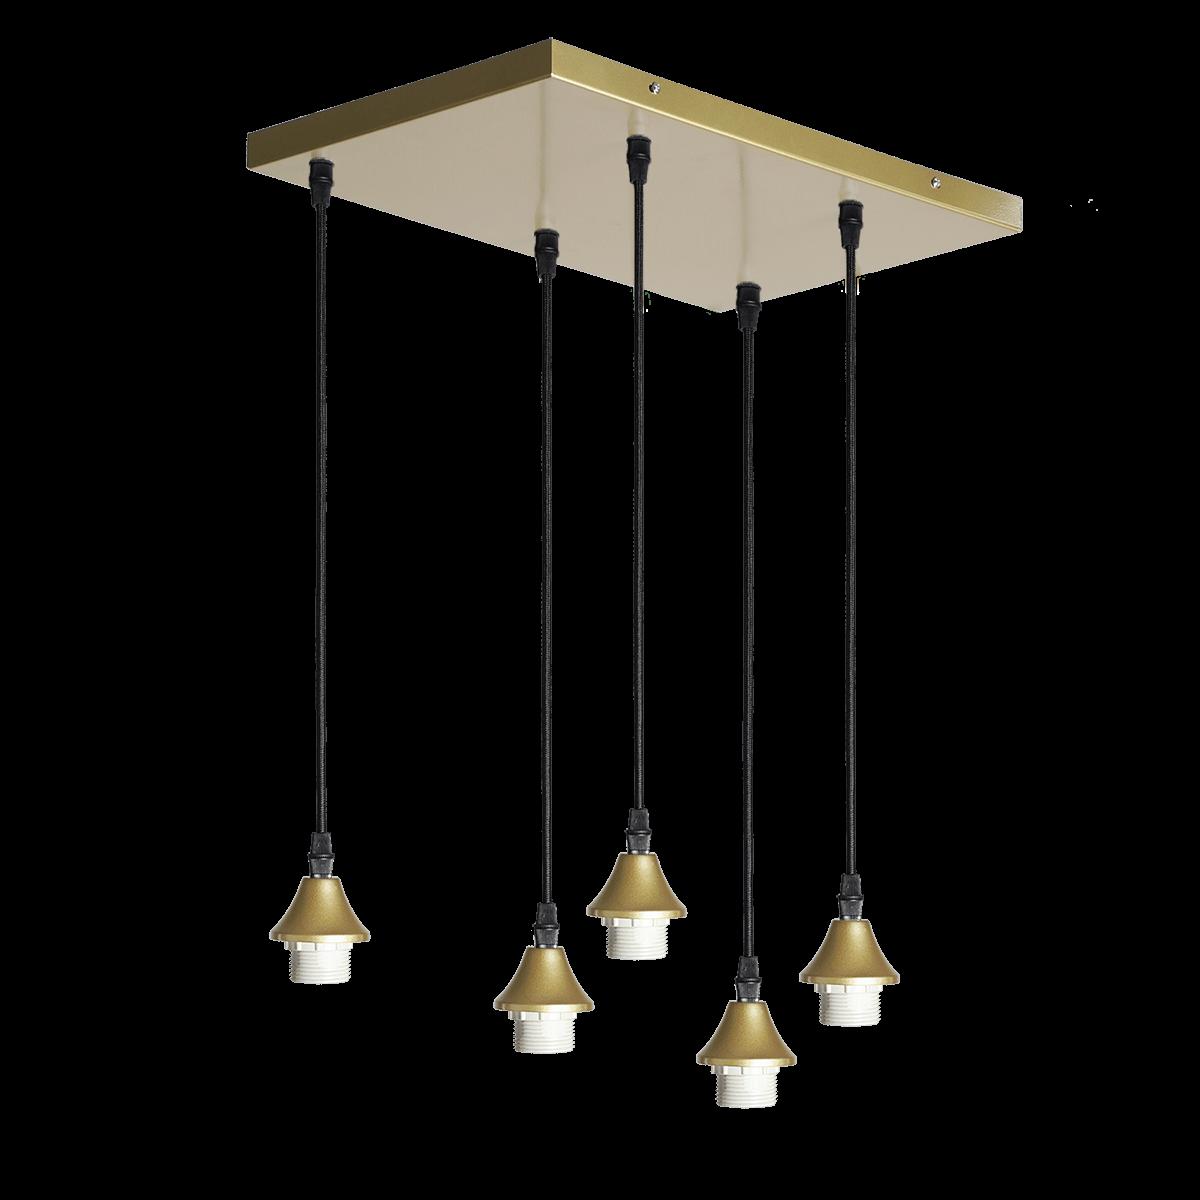 Hanglamp Vilmar 5 lichts goud